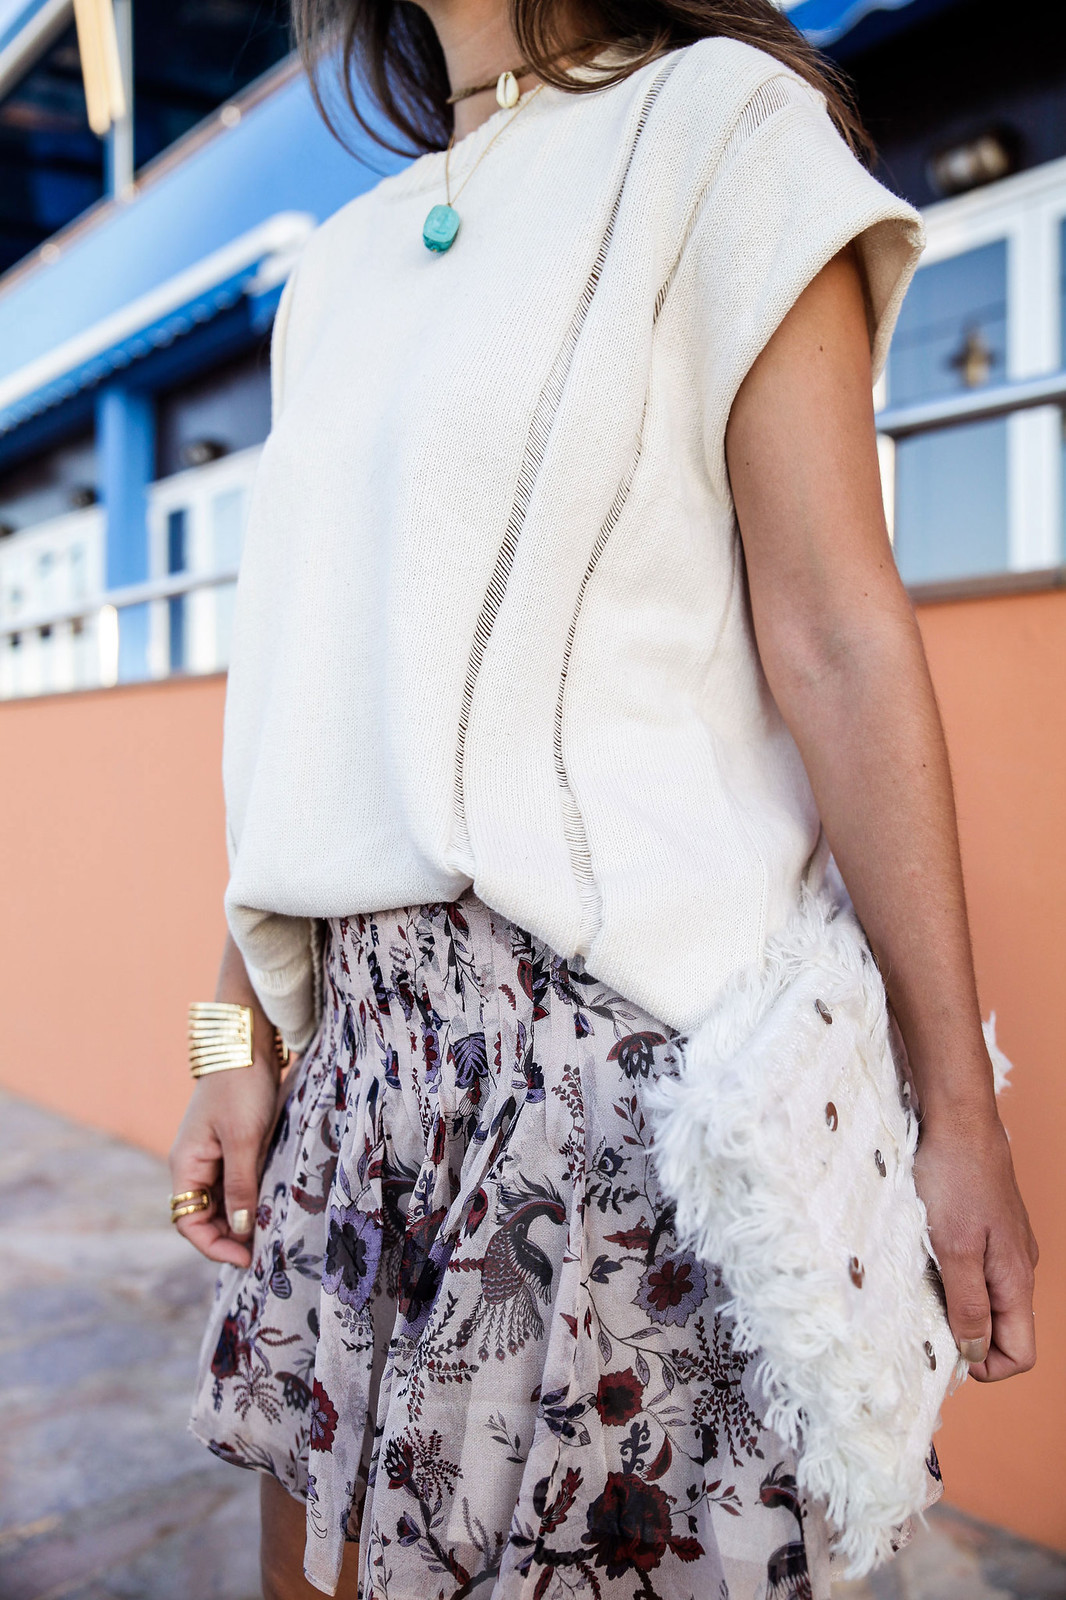 012_blusa_punto_falda_flores_summer_outfit_theguestgirl_rüga_schade_jewels_steve_madden_.magali_pasacal_influencer_barcelona_blogger